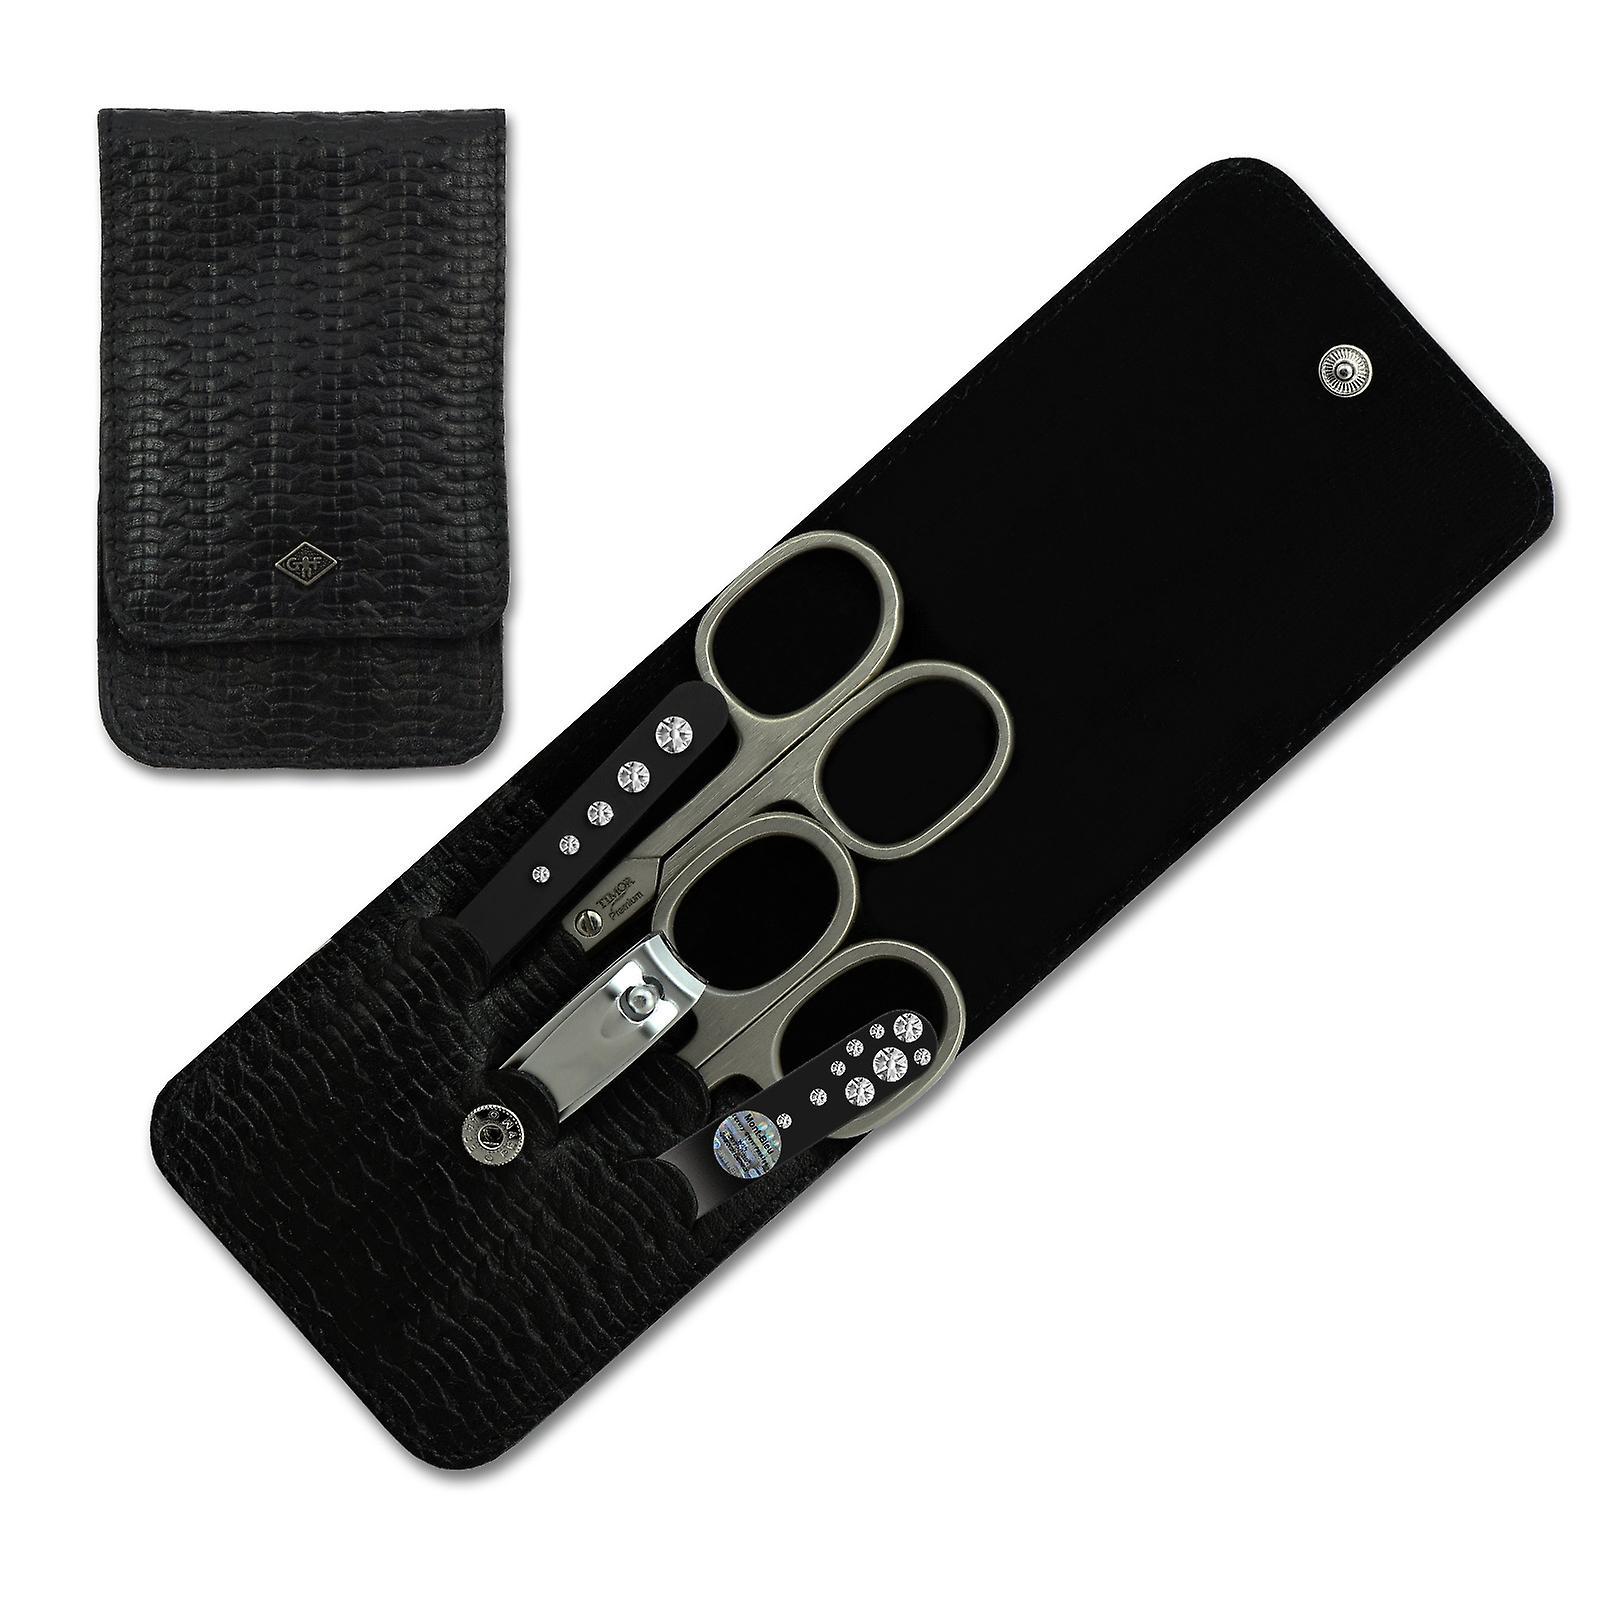 Luxury Solingen 5-Piece Manicure Set for Women with Swarovski crystals in Black Braid Leather Case